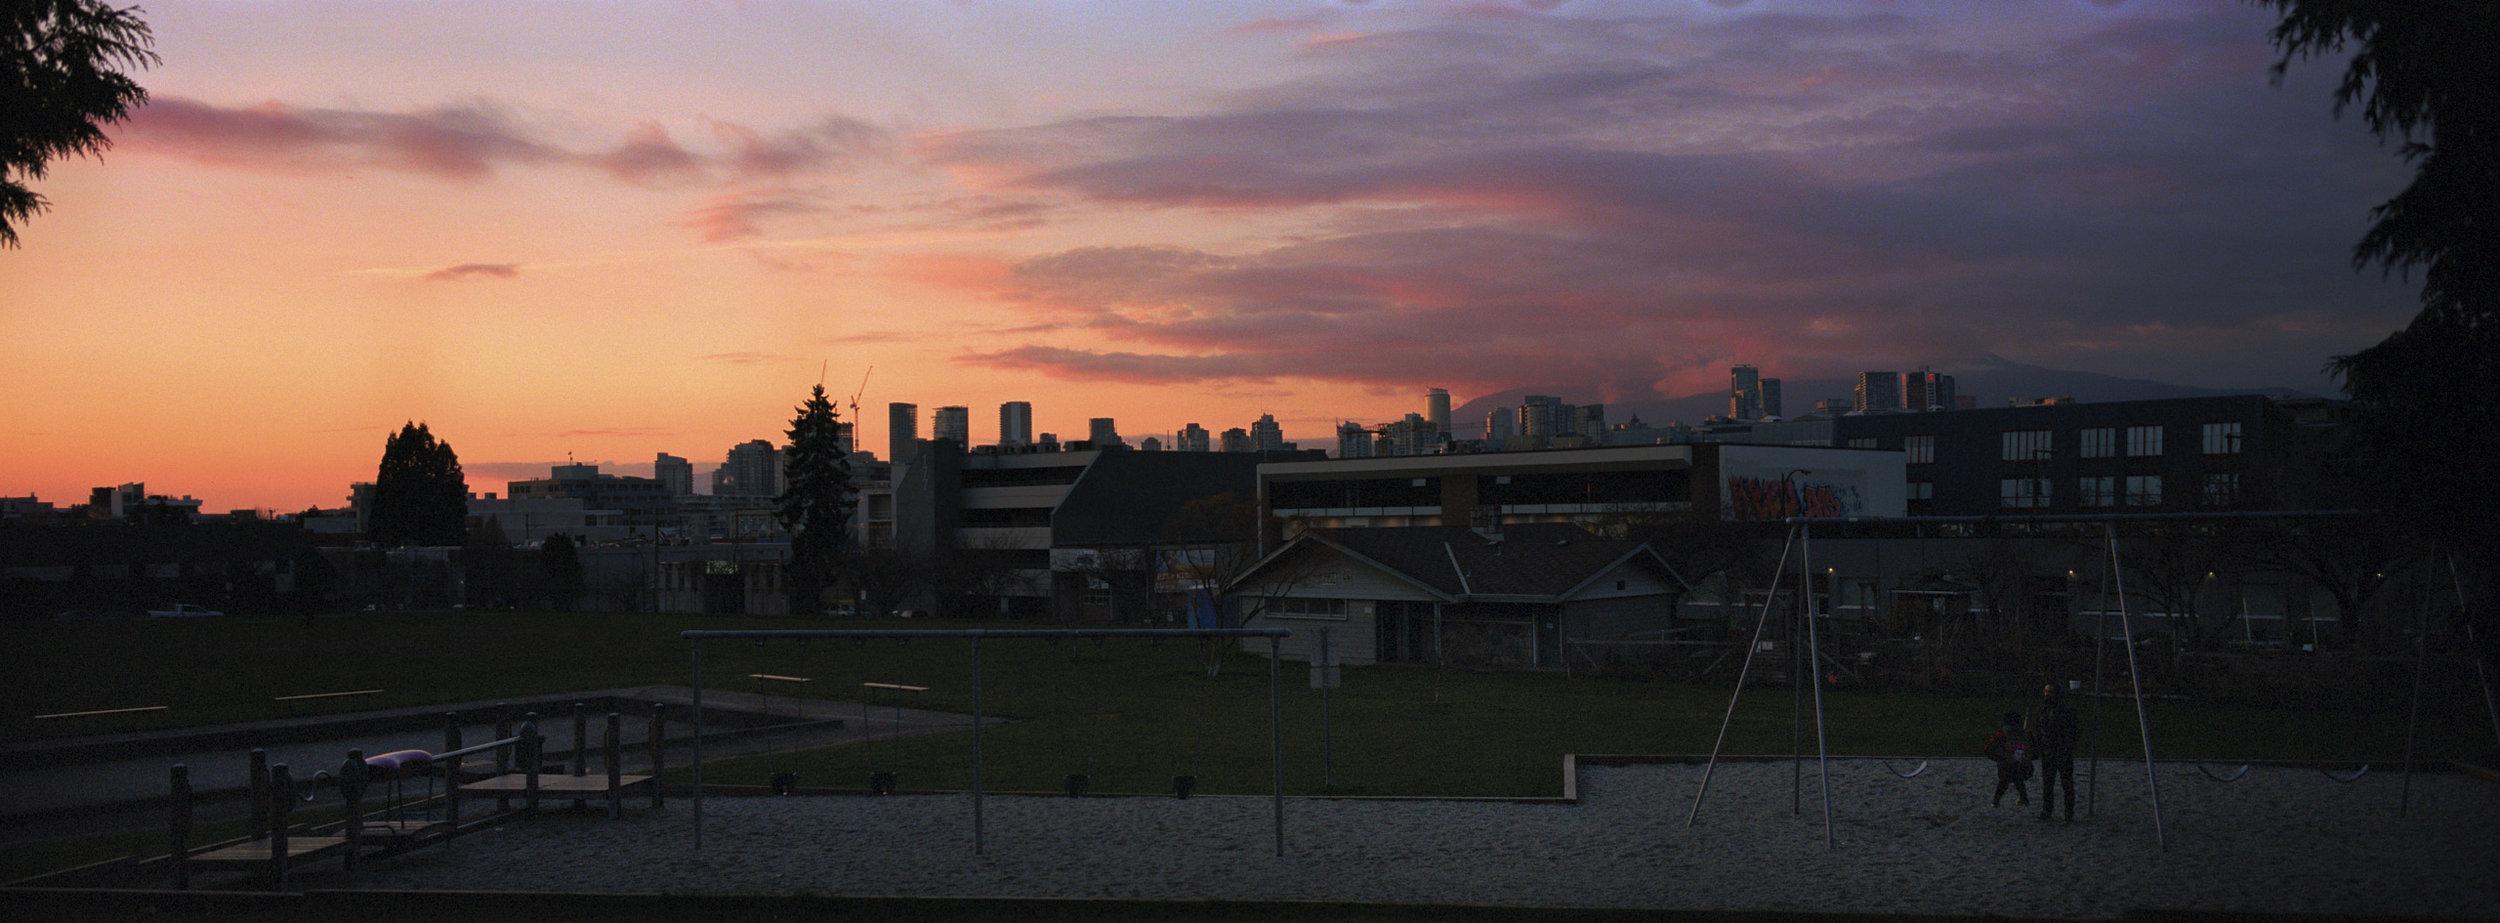 Jonathan Rogers Park, Vancouver